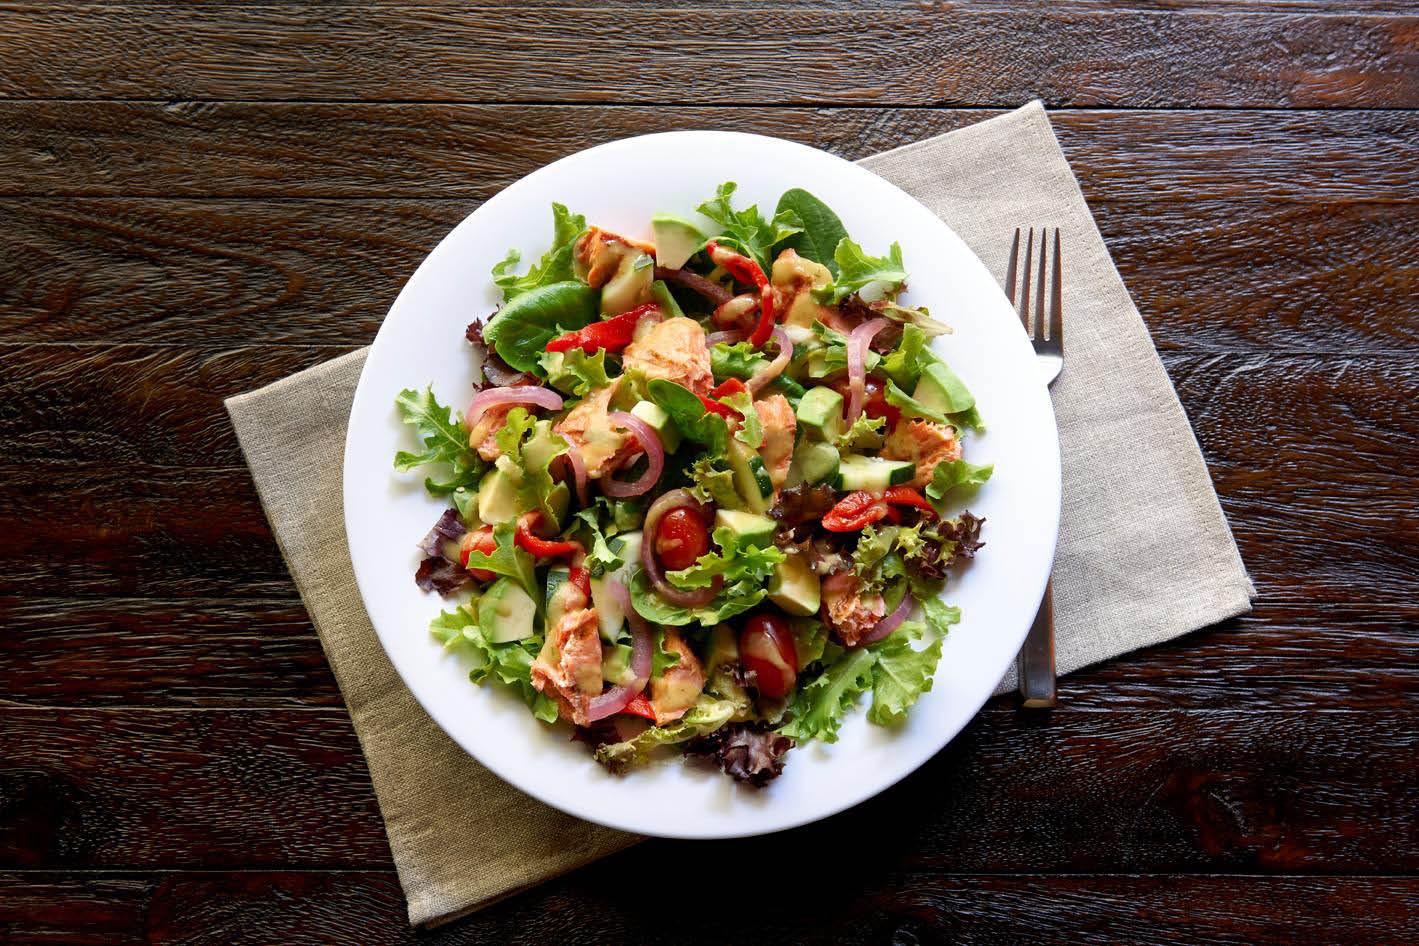 jason's deli albuquerque salad